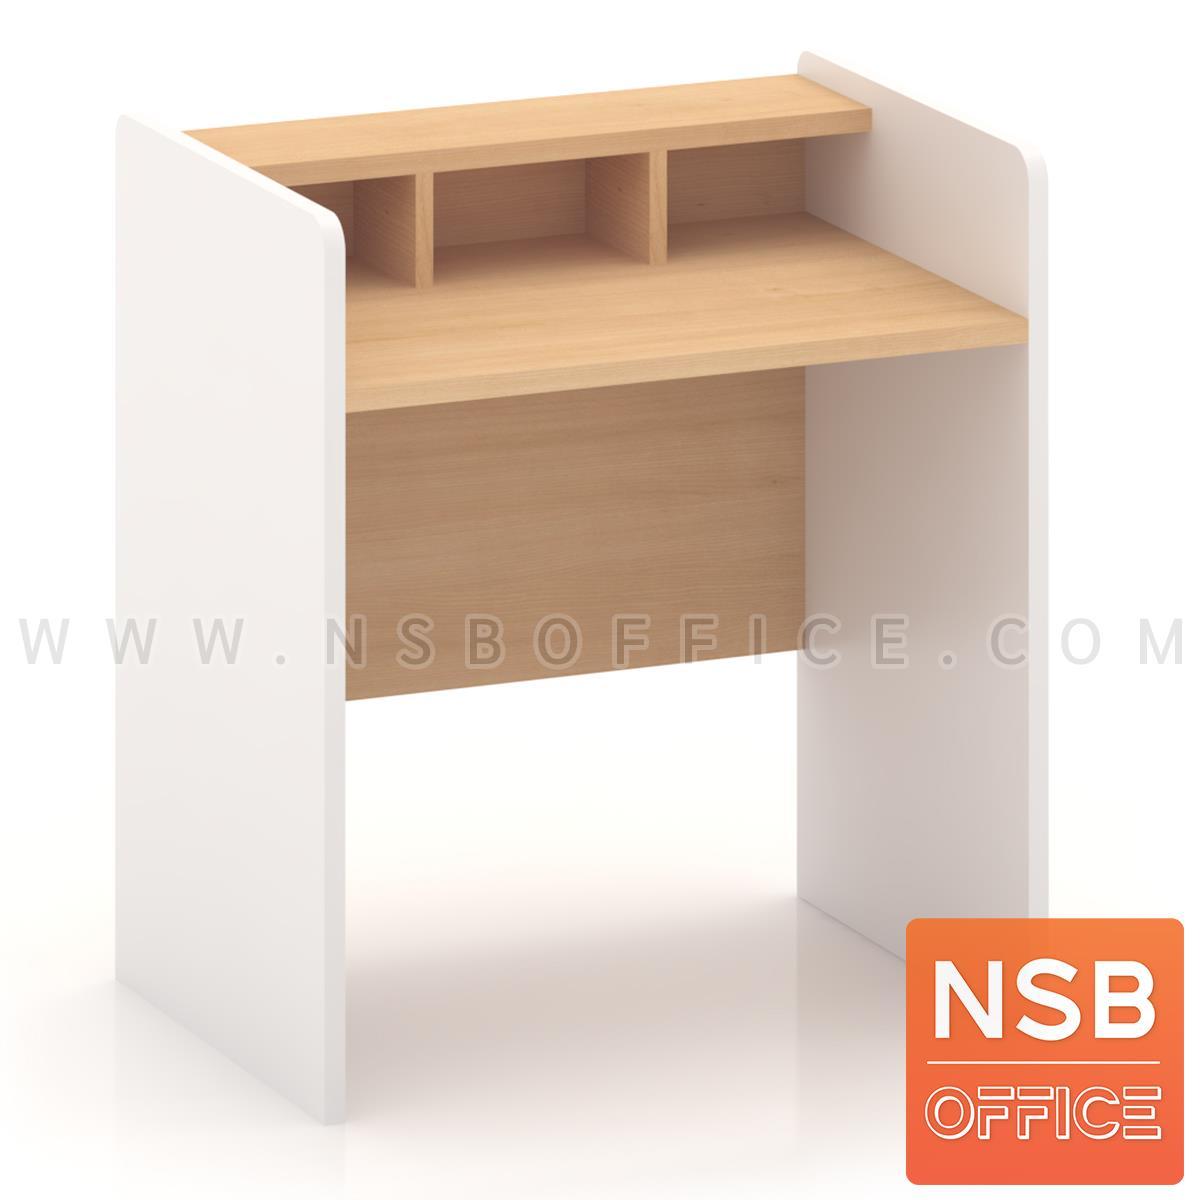 A13A217:โต๊ะทำงานคอมพิวเตอร์ รุ่น Began (บีแกนน์) ขนาด 80W, 100W cm.